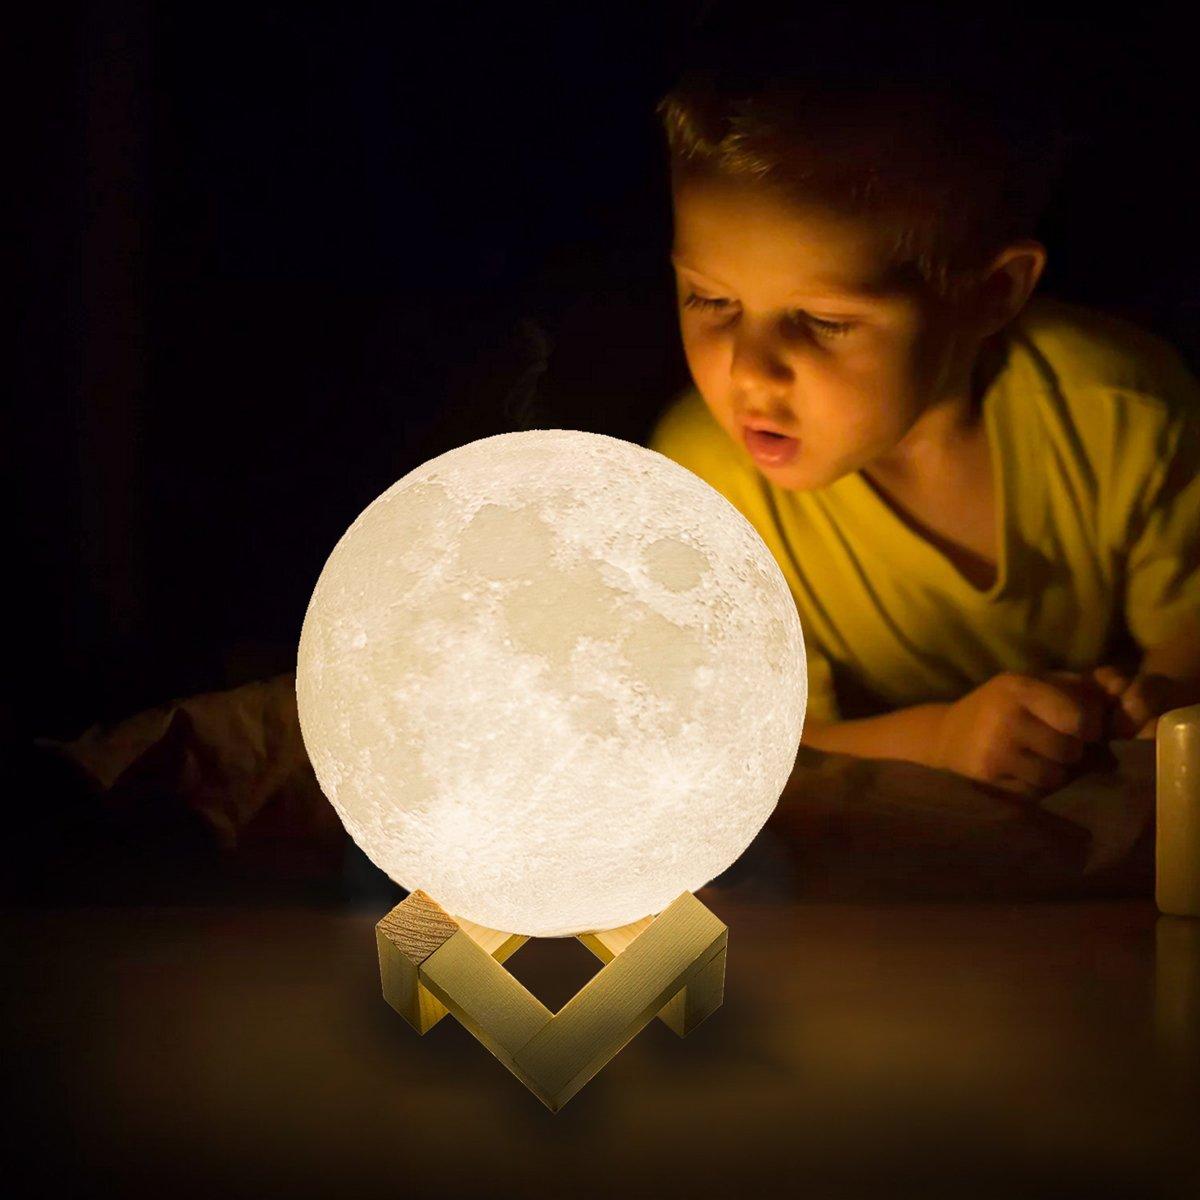 Lámpara de Luna nocturna con Interruptor táctil LED, impresión 3D recargable, adornos navideños para el hogar Kerst PLA para exteriores